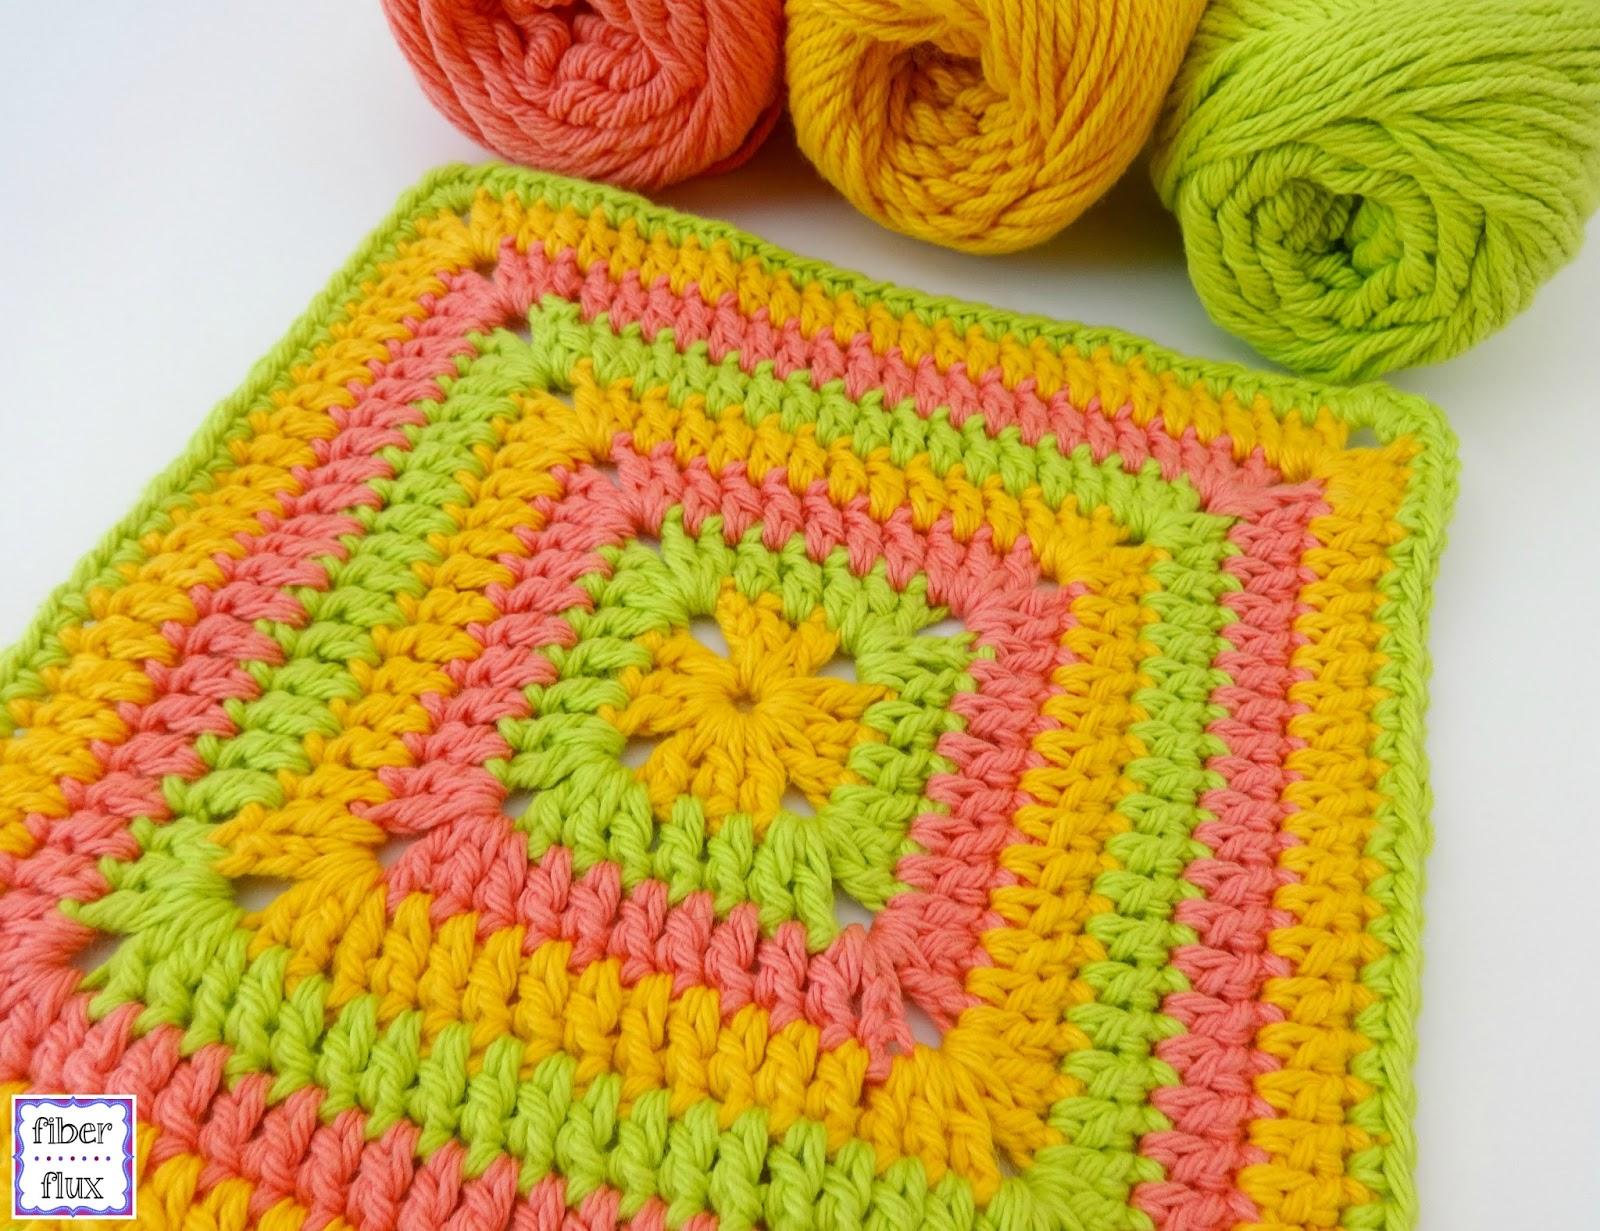 Fiber flux free crochet patternopical punch dishcloth free crochet patternopical punch dishcloth bankloansurffo Gallery